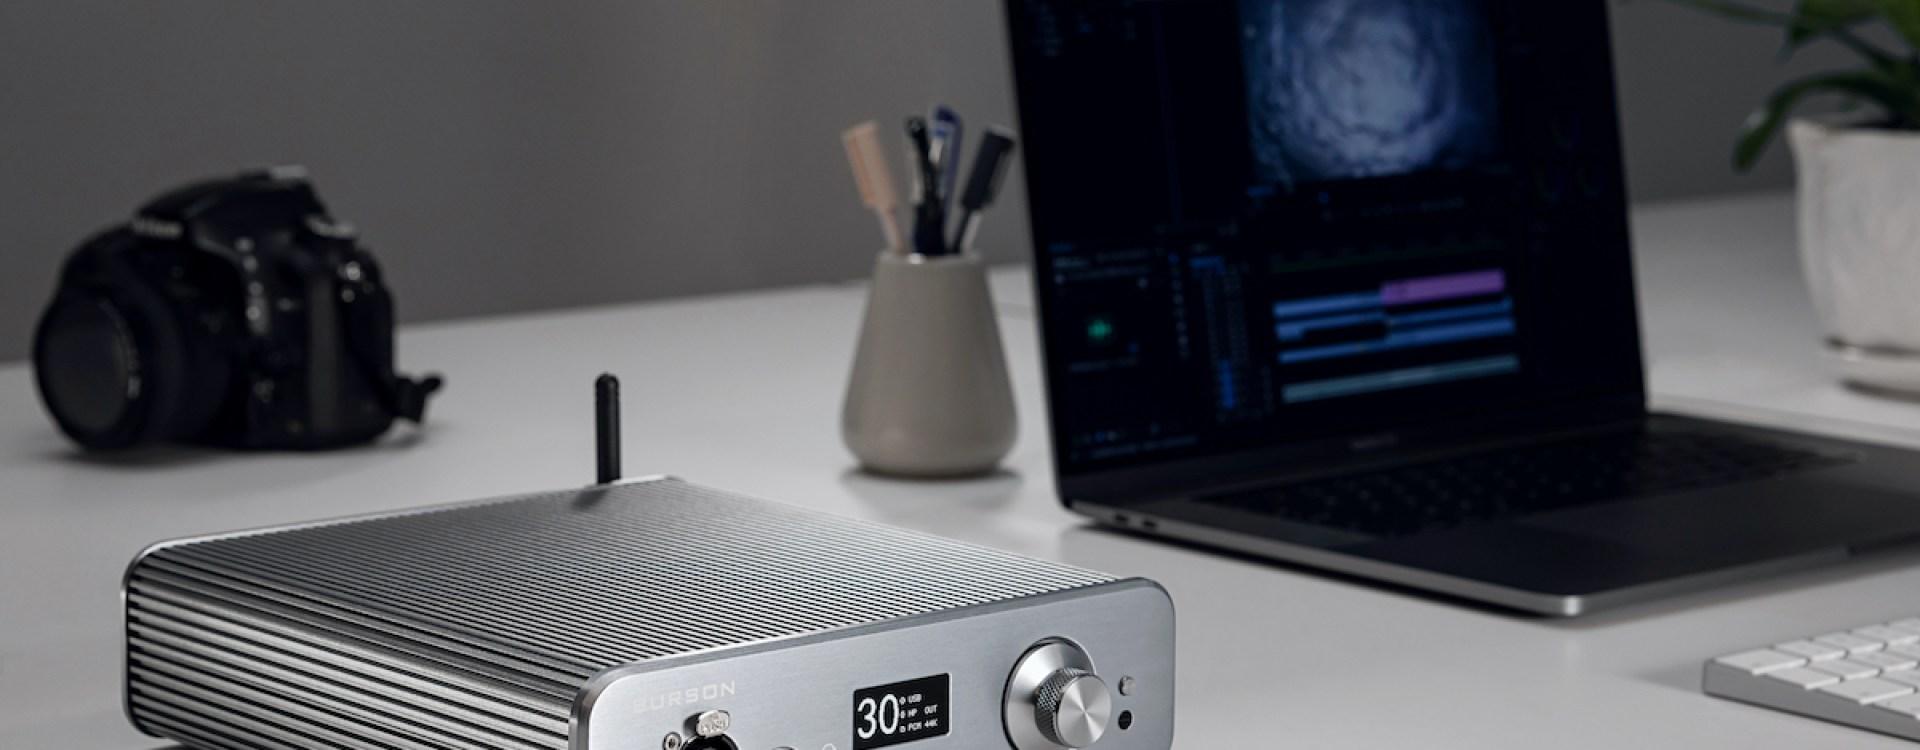 M-180X-Desktop-5